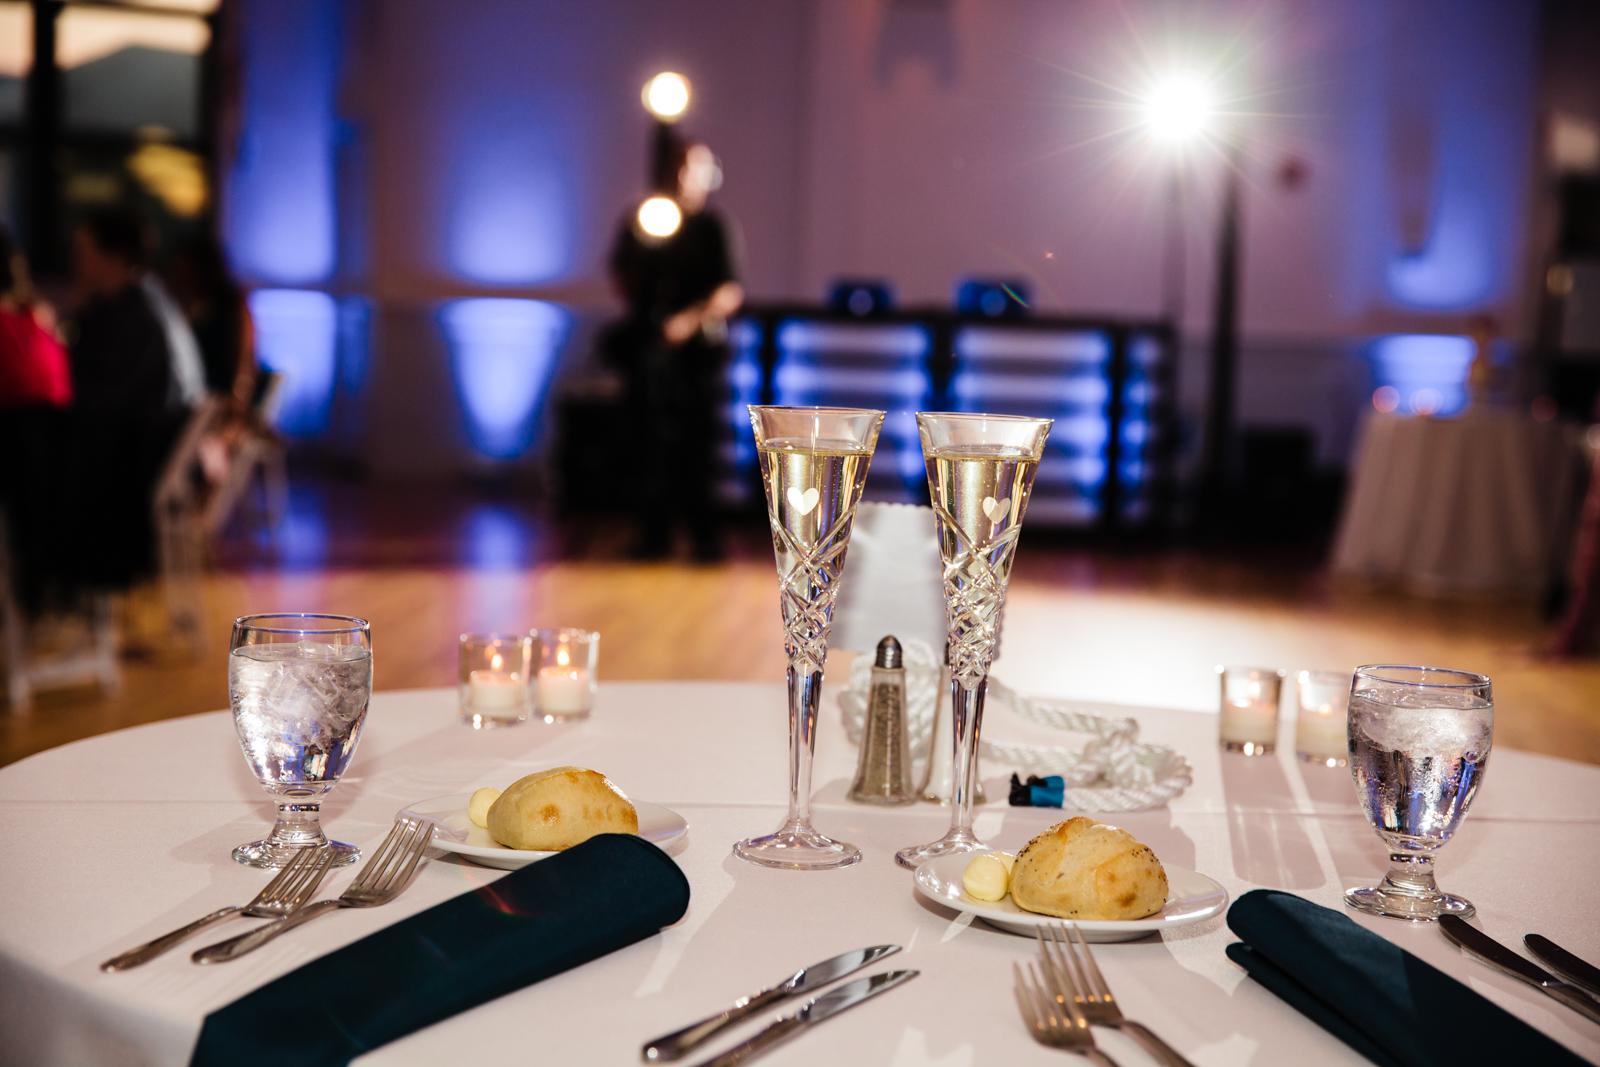 Eastons-Beach-Rotunda-Ballroom-Wedding-Newport-Rhode-Island-PhotographybyAmandaMorgan-98.jpg